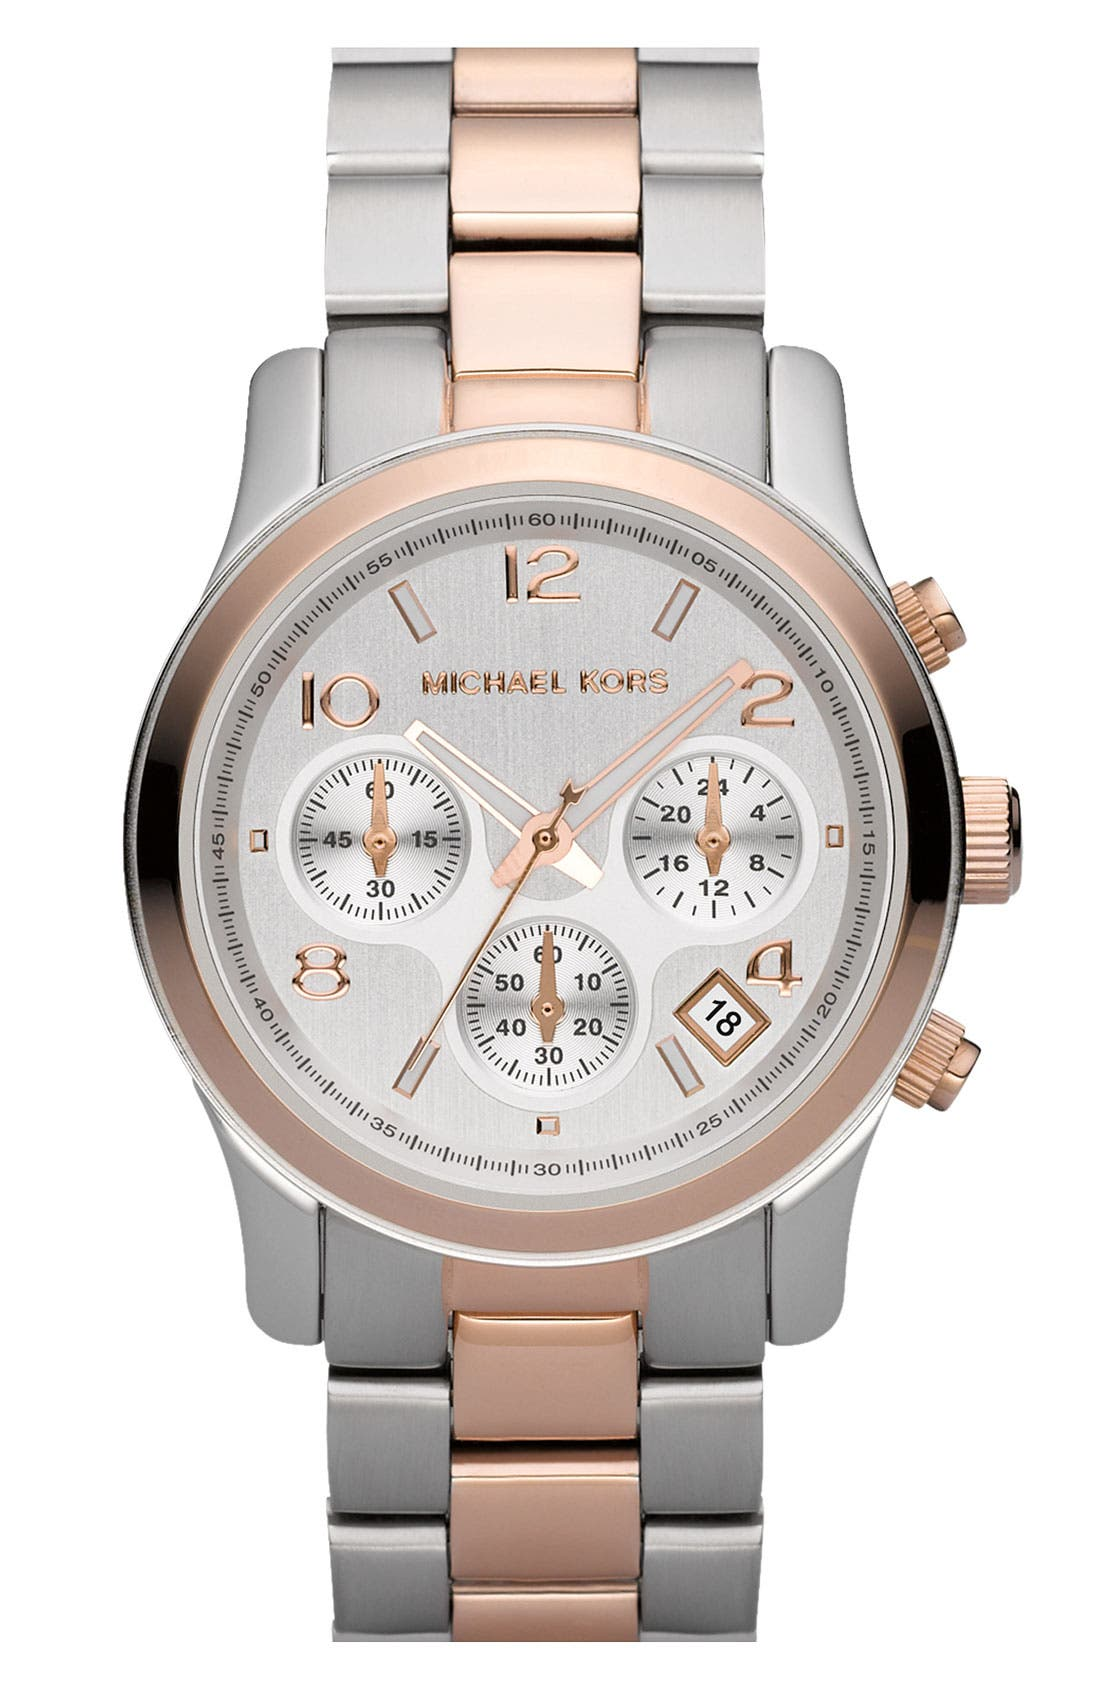 Main Image - Michael Kors 'Runway' Chronograph Watch